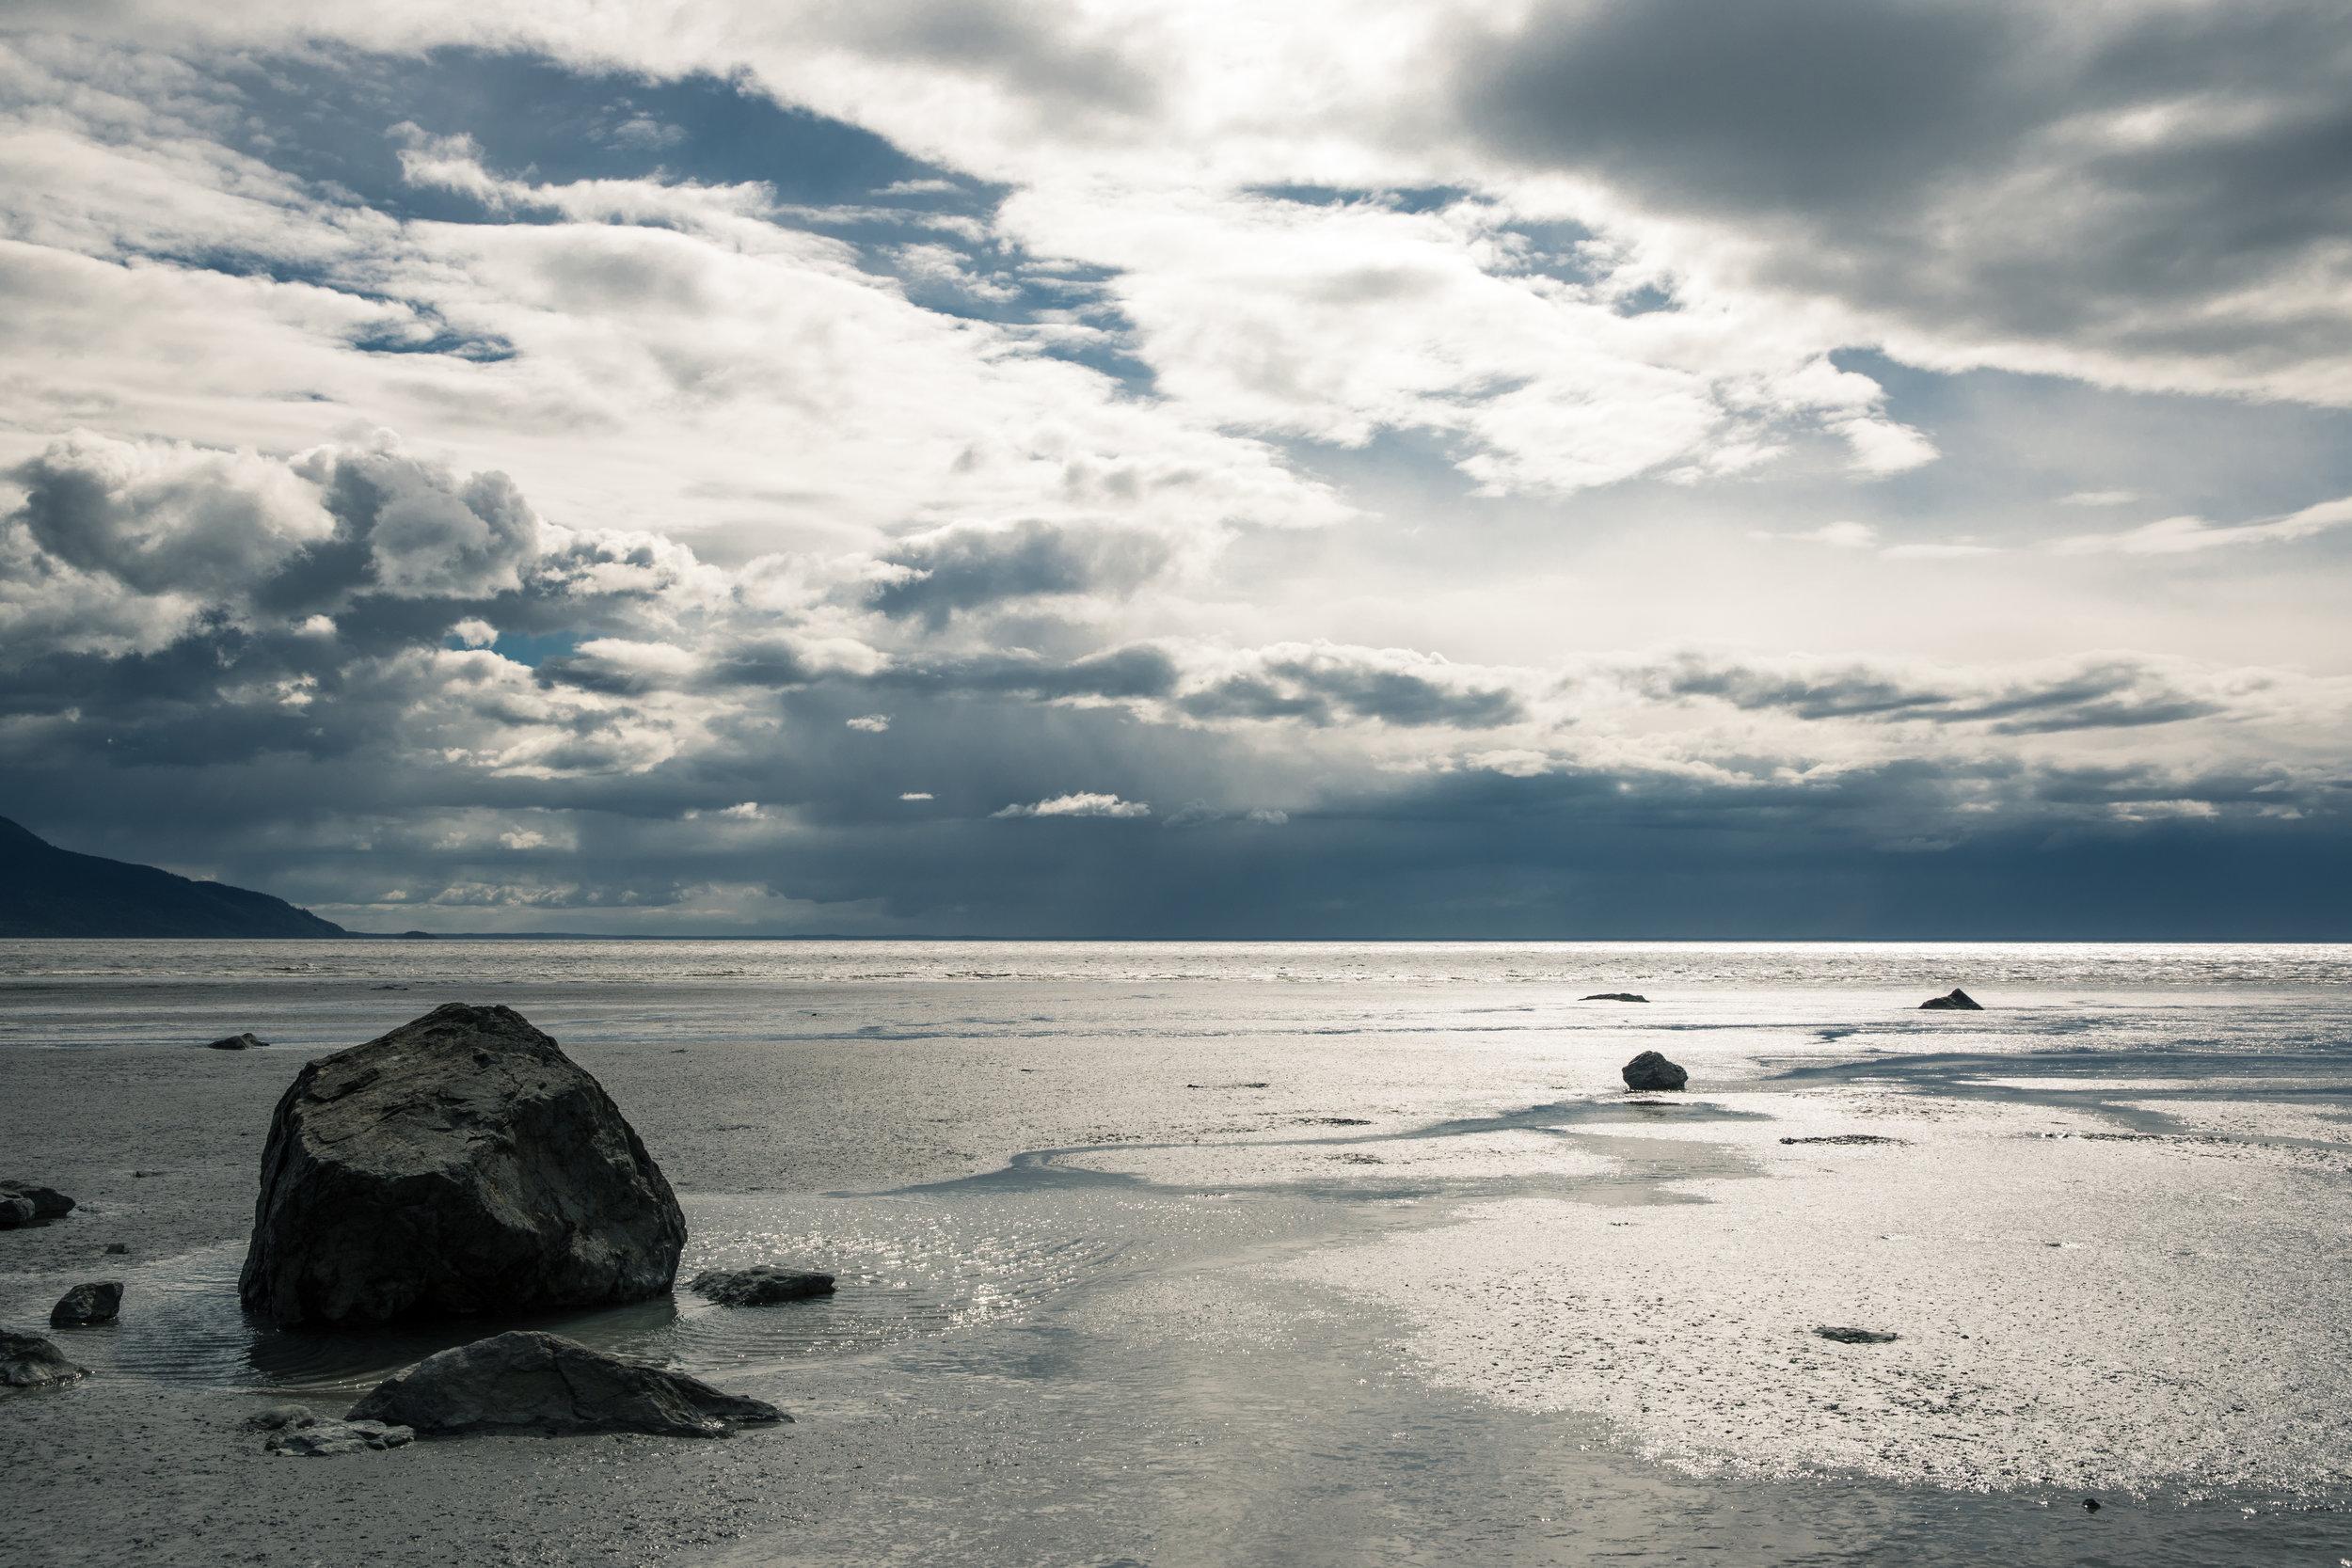 052819_Alaska-849.jpg